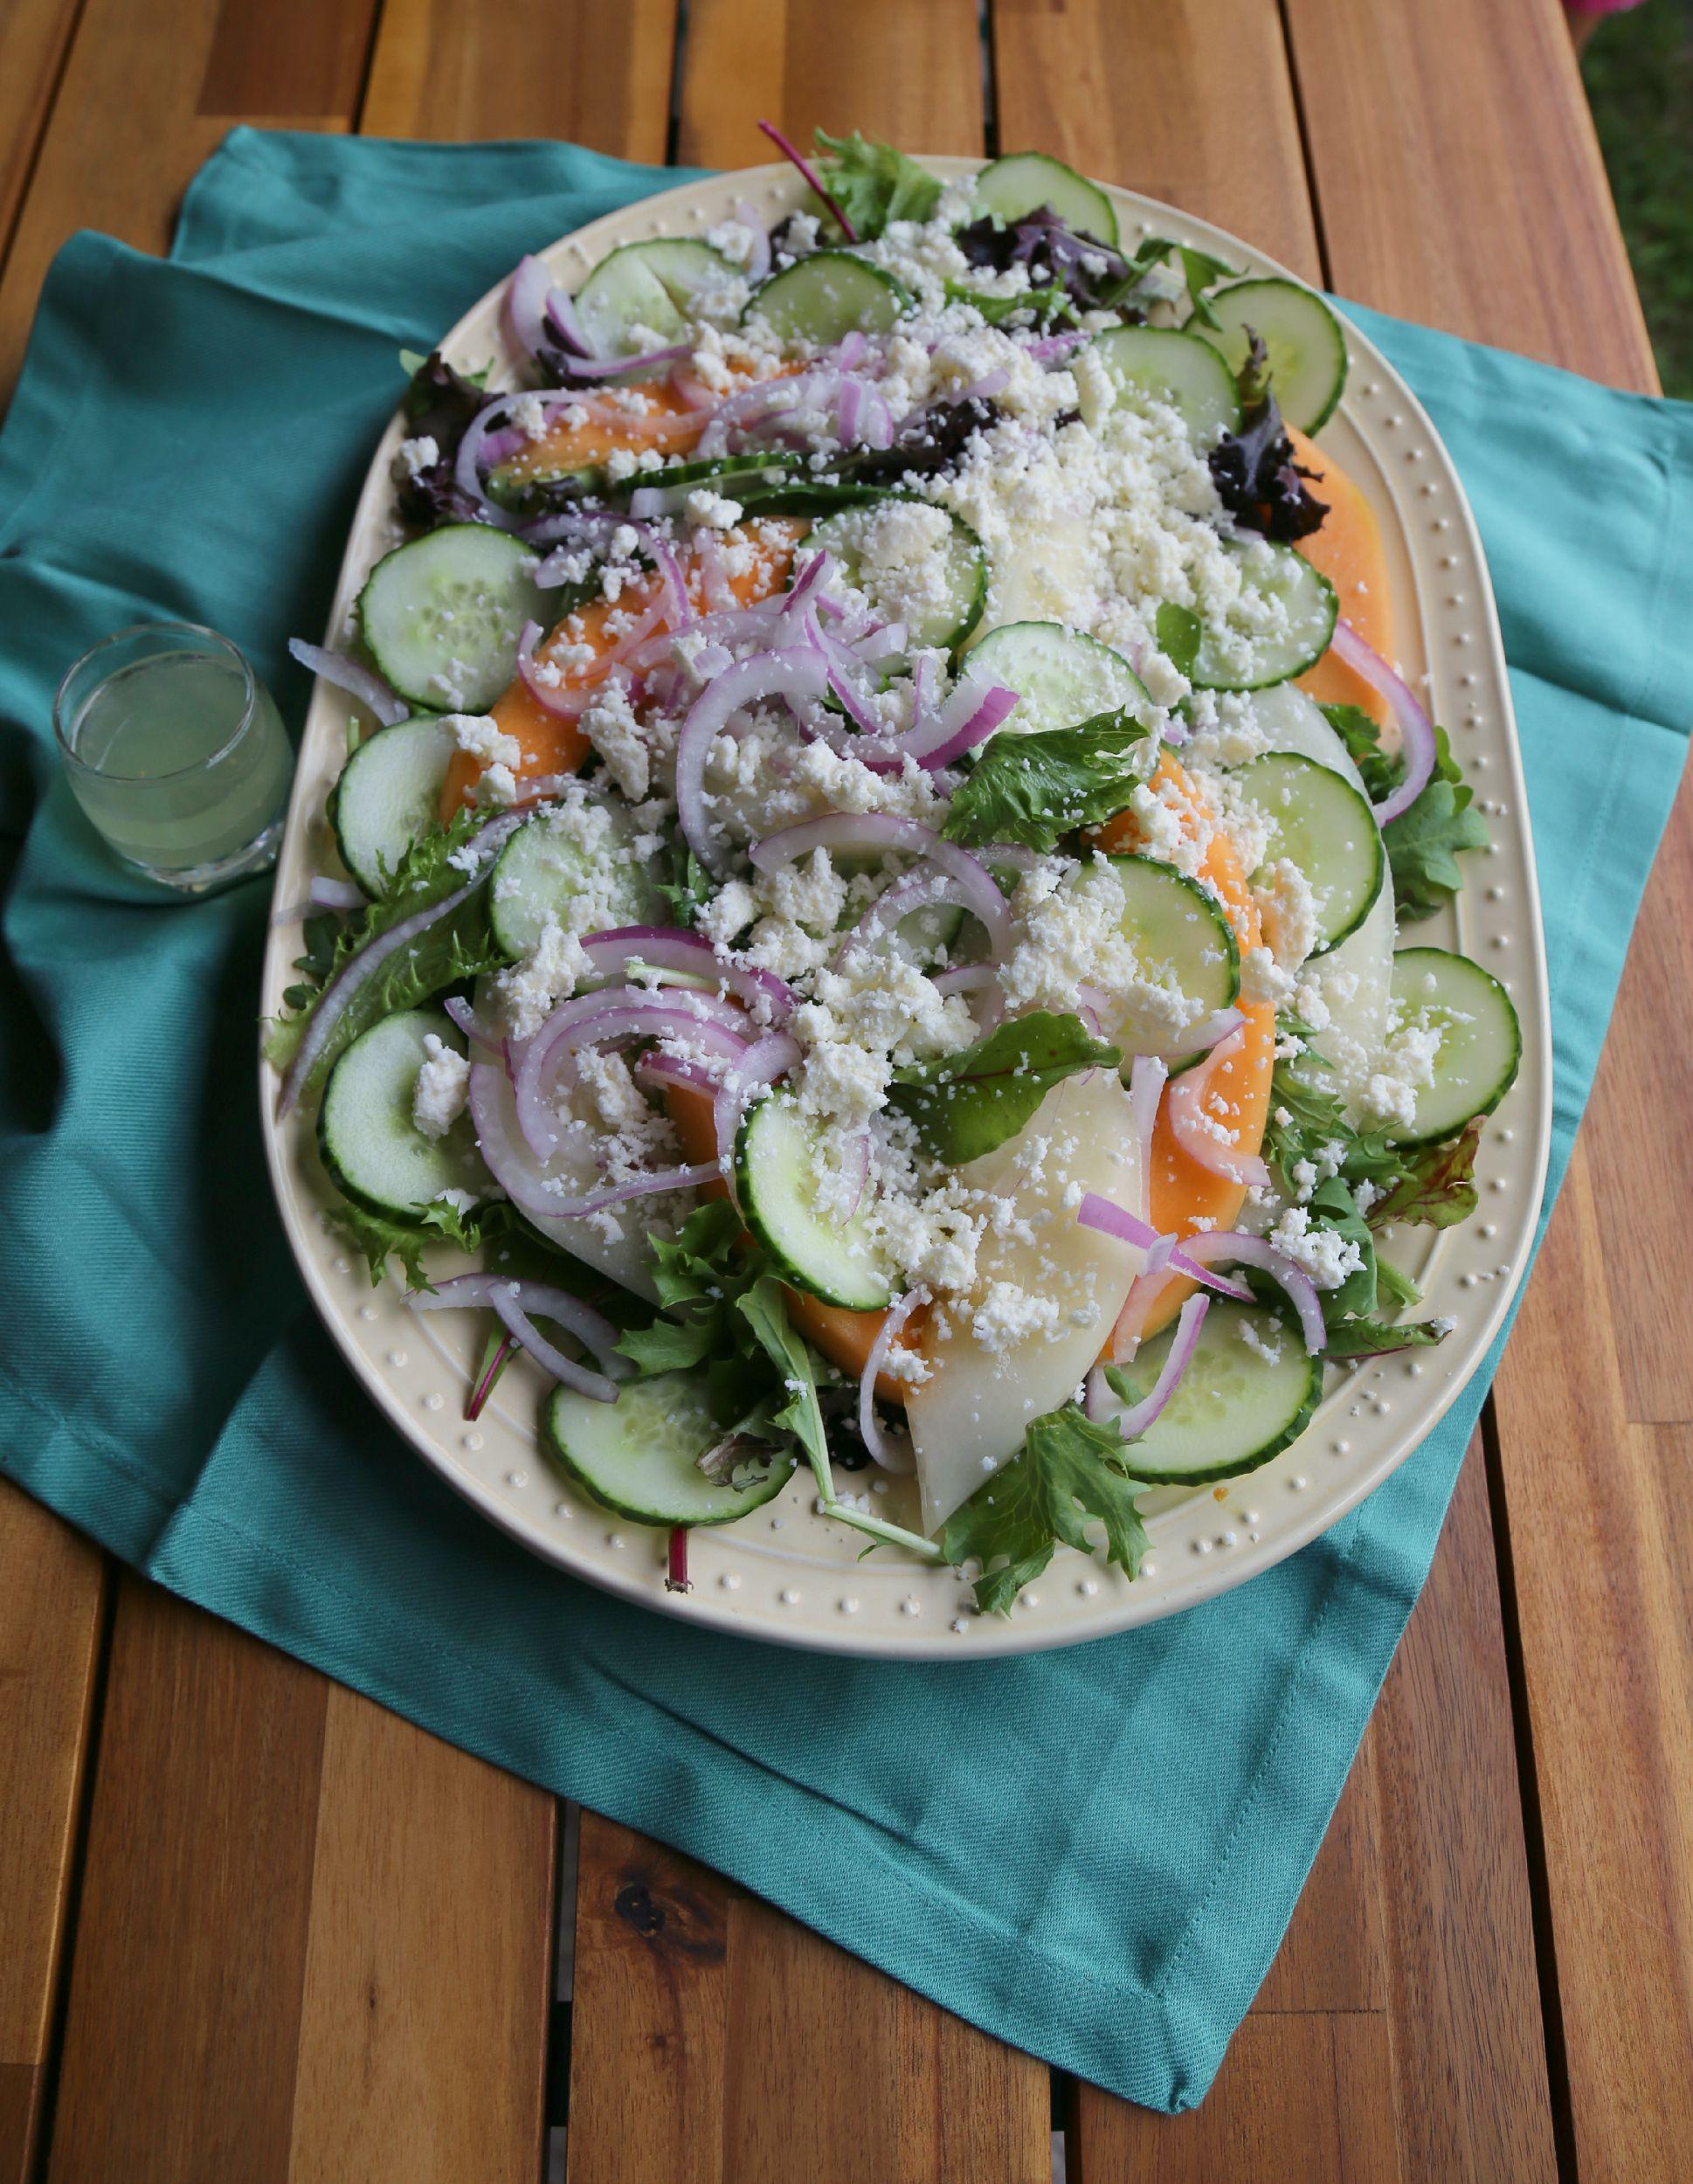 melon-salad-tequila-lime-dressing-vianneyrodriguez-sweetlifebake